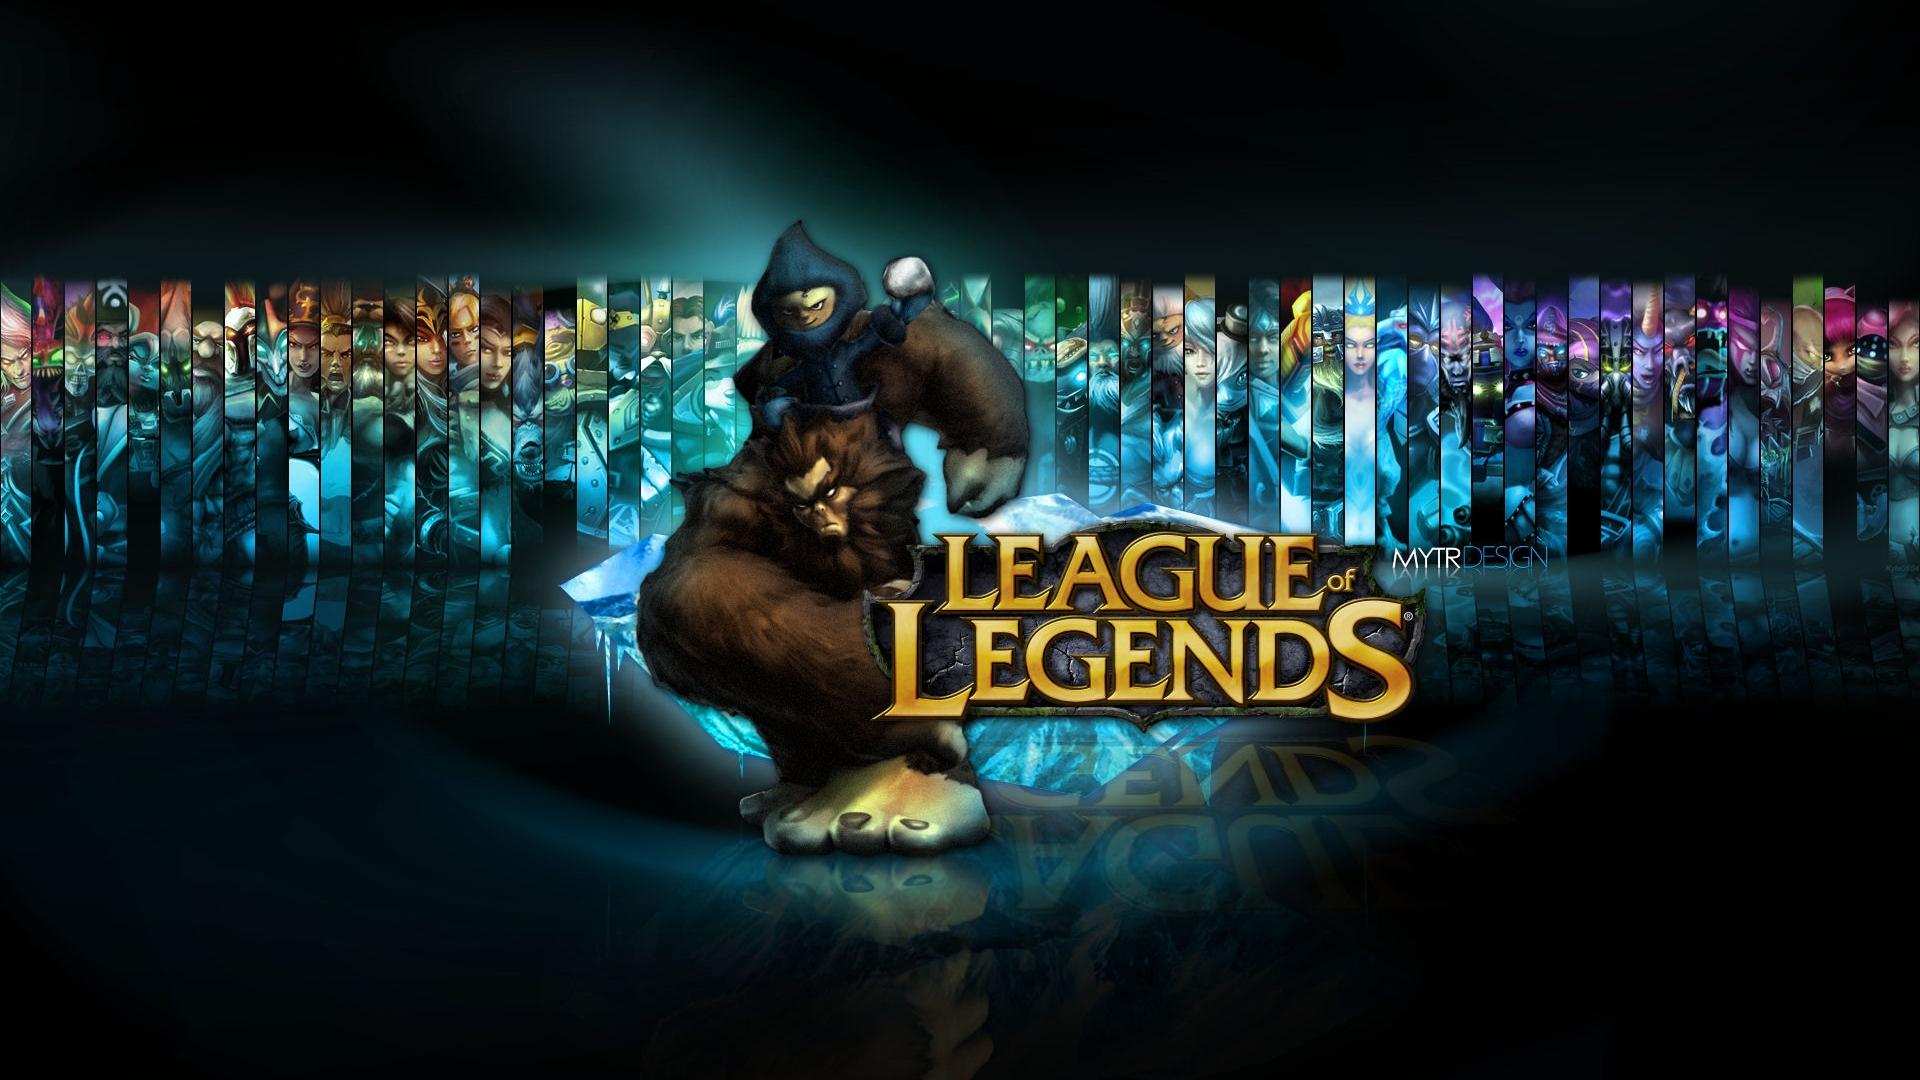 League Of Legends Wallpaper League Of Legends 壁紙 Hd Wallpaper Backgrounds Download